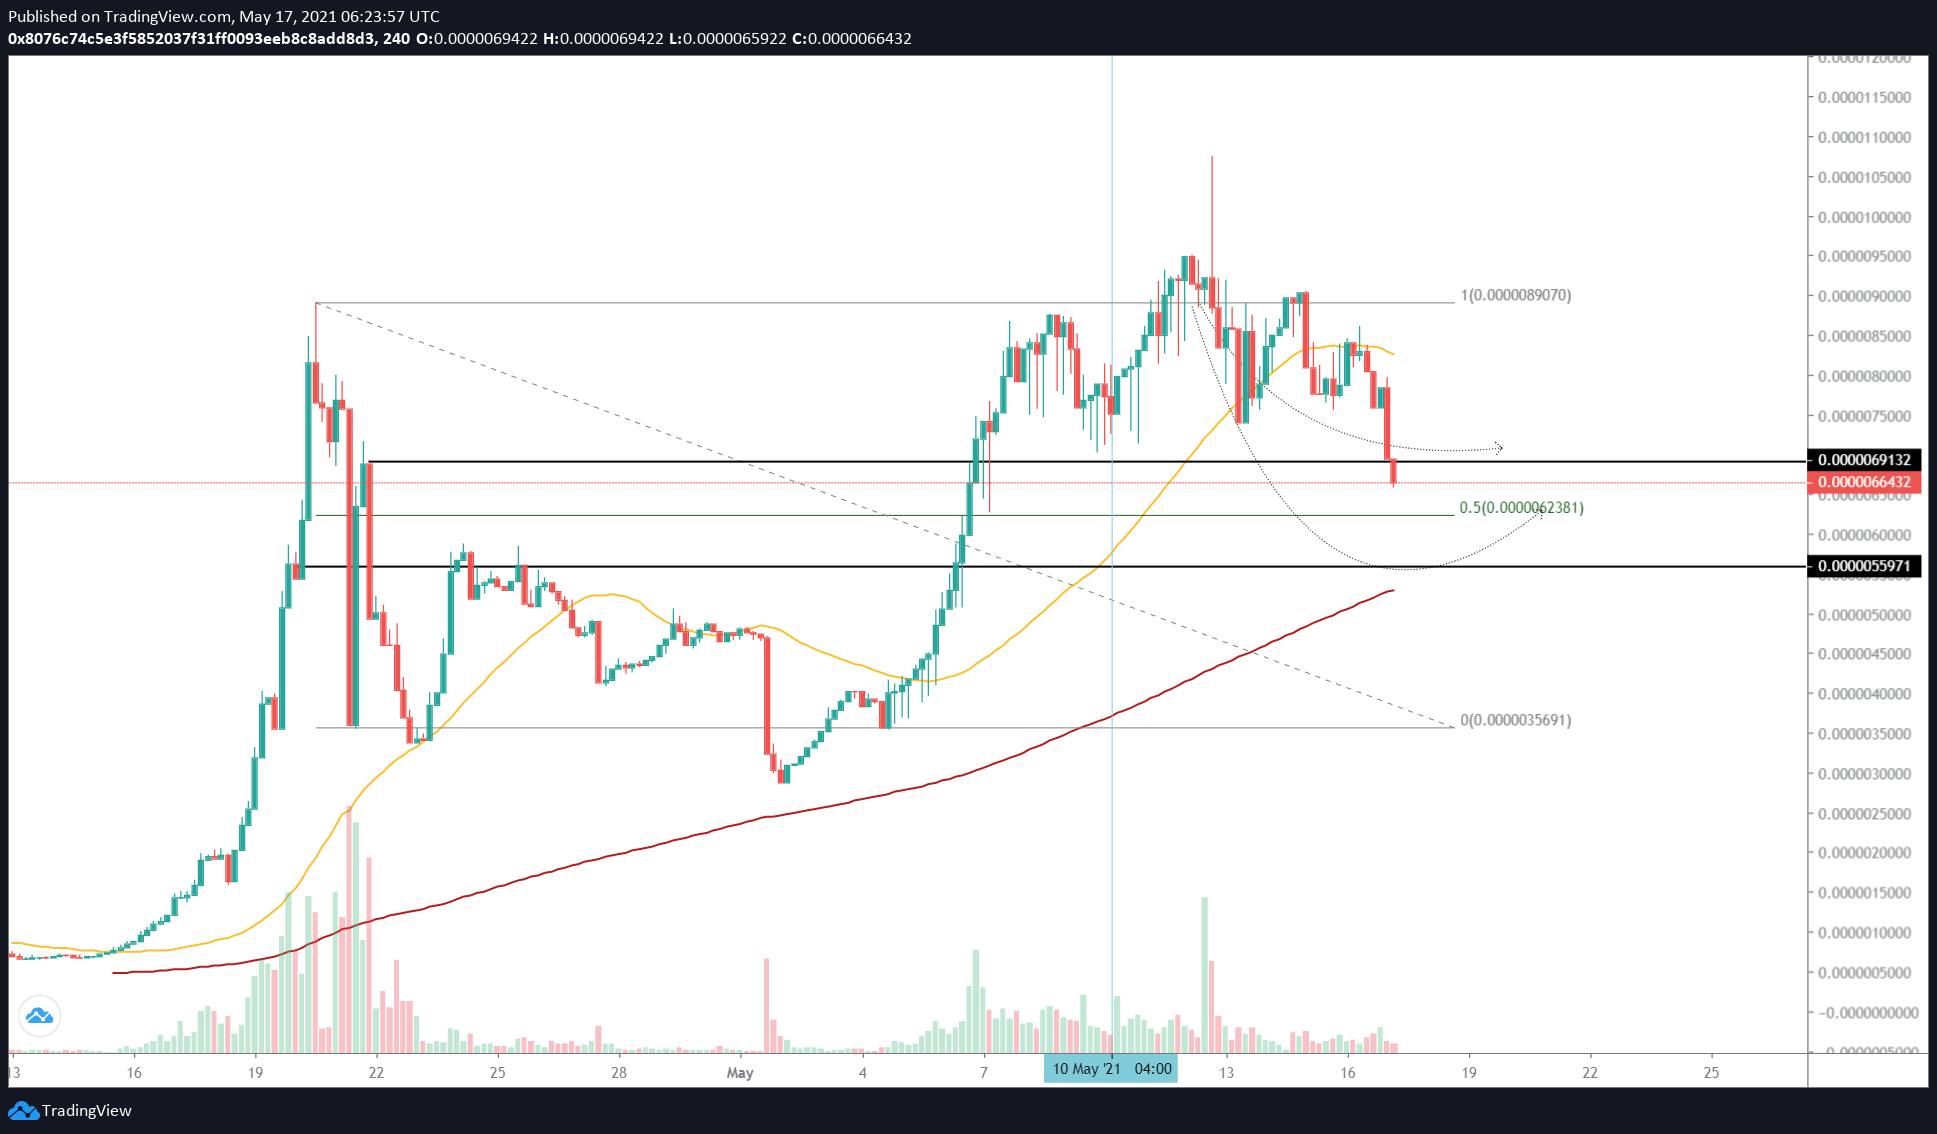 SAFEMOON/USDT 4-hour chart